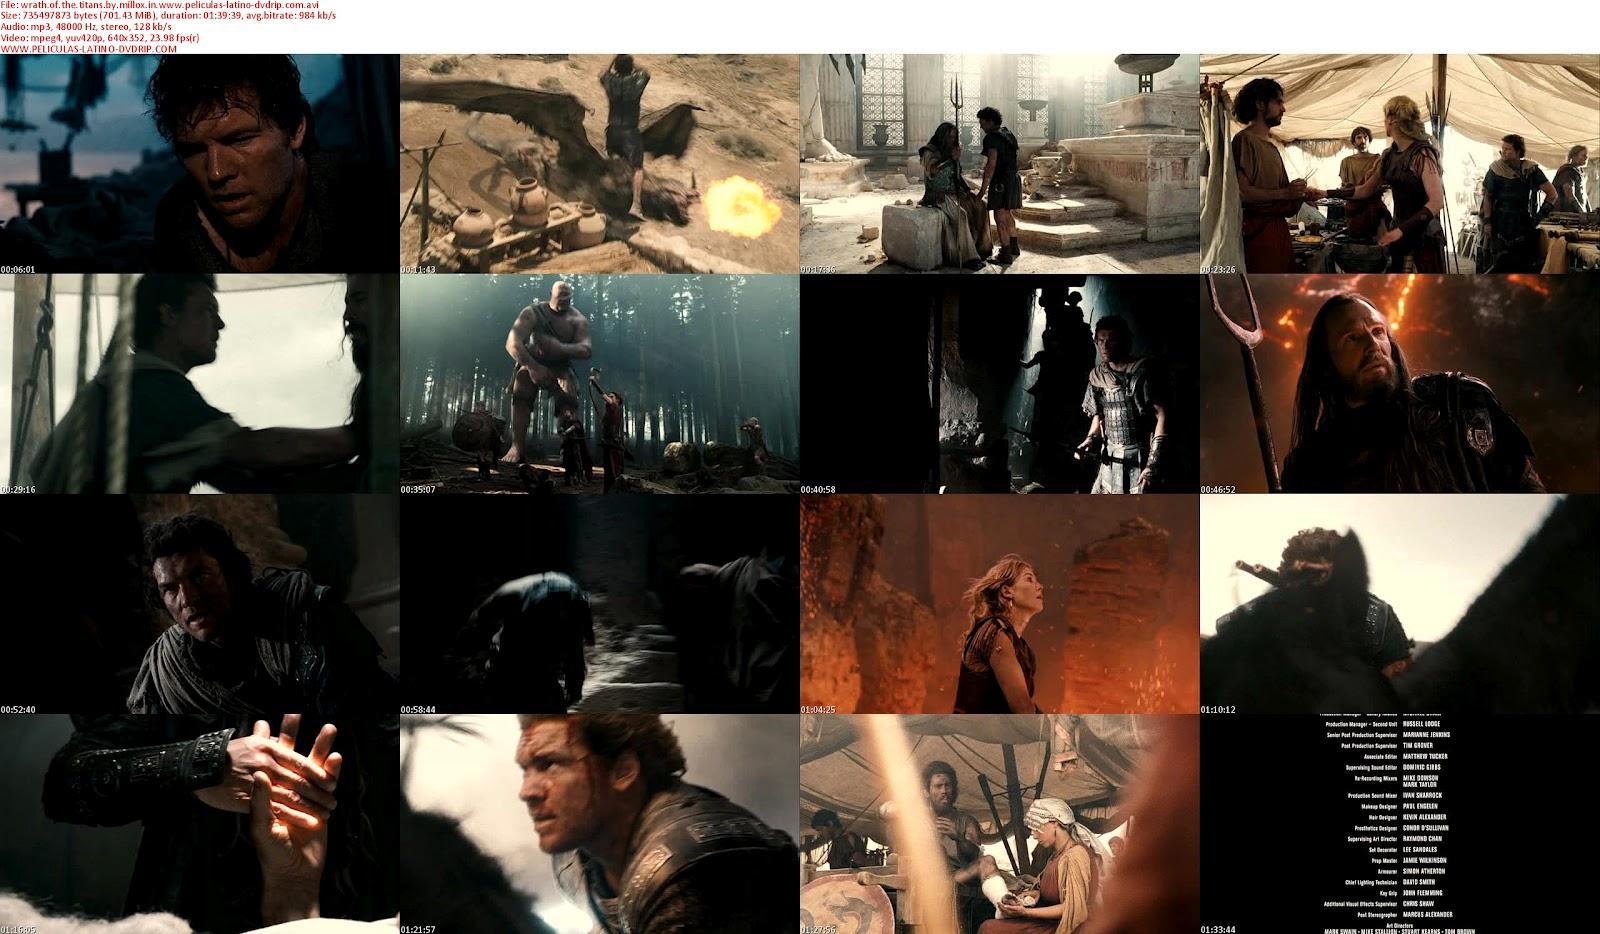 http://2.bp.blogspot.com/-i9dSrV55dAA/T9krzIYW6eI/AAAAAAAACGA/J9Mz4C5ONvk/s1600/wrath_of_the_titans_by_millox_in_www_peliculas-latino-dvdrip_com_s.jpg